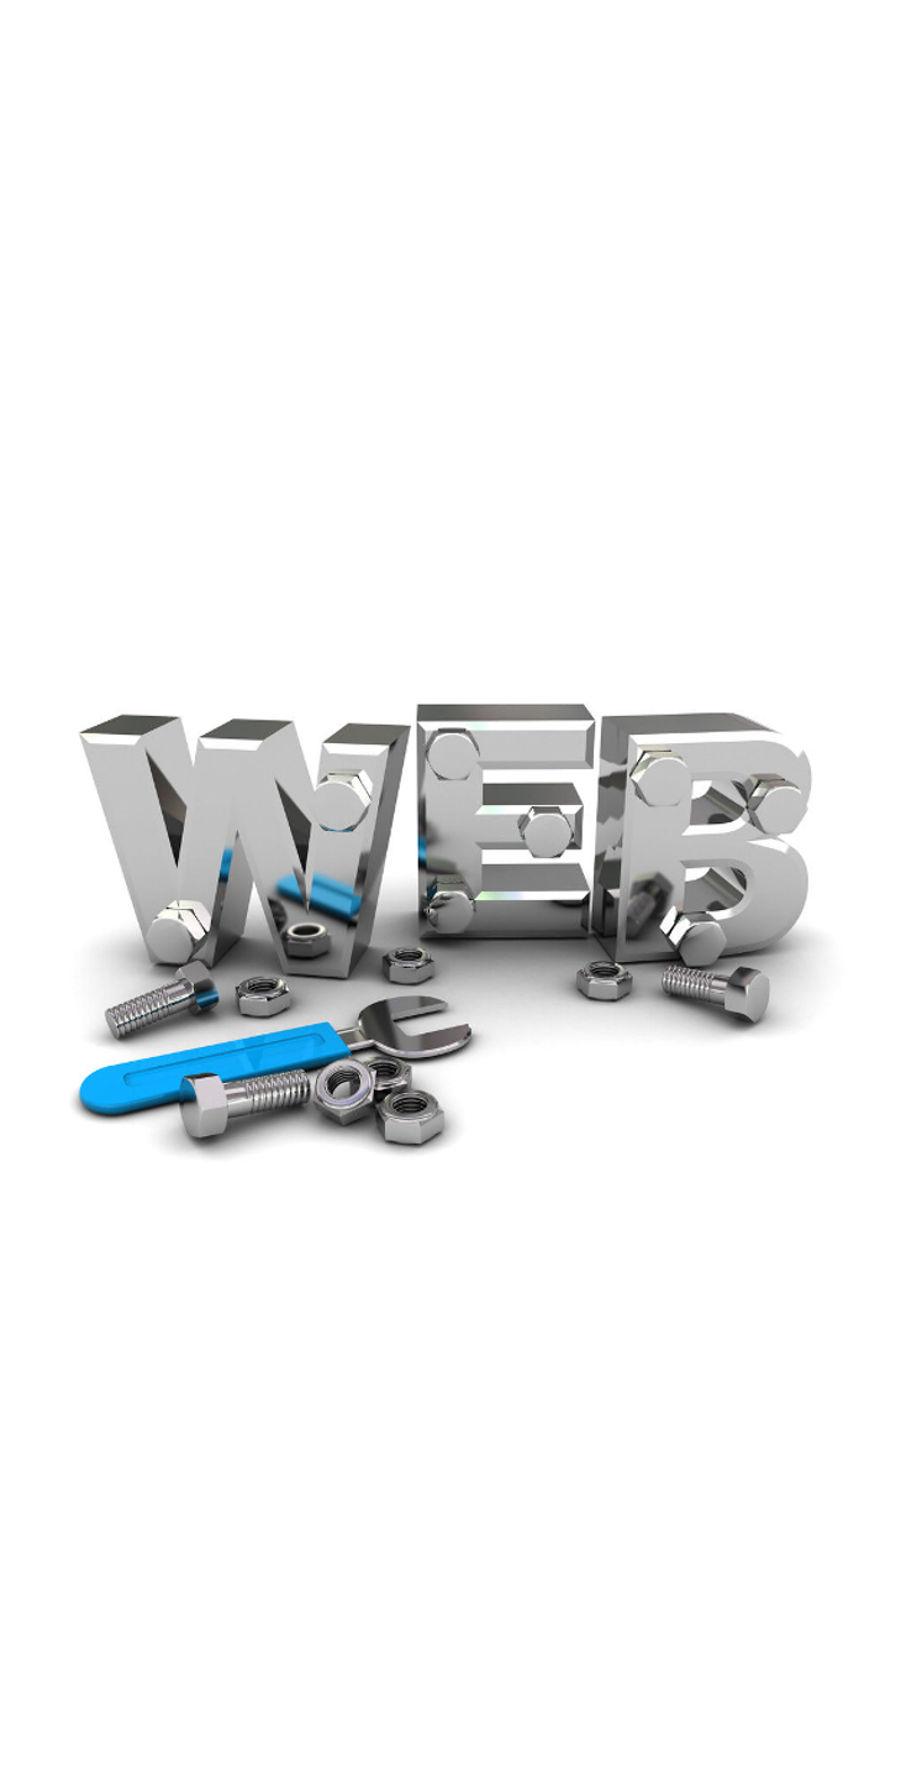 Web Development A&B Group 3